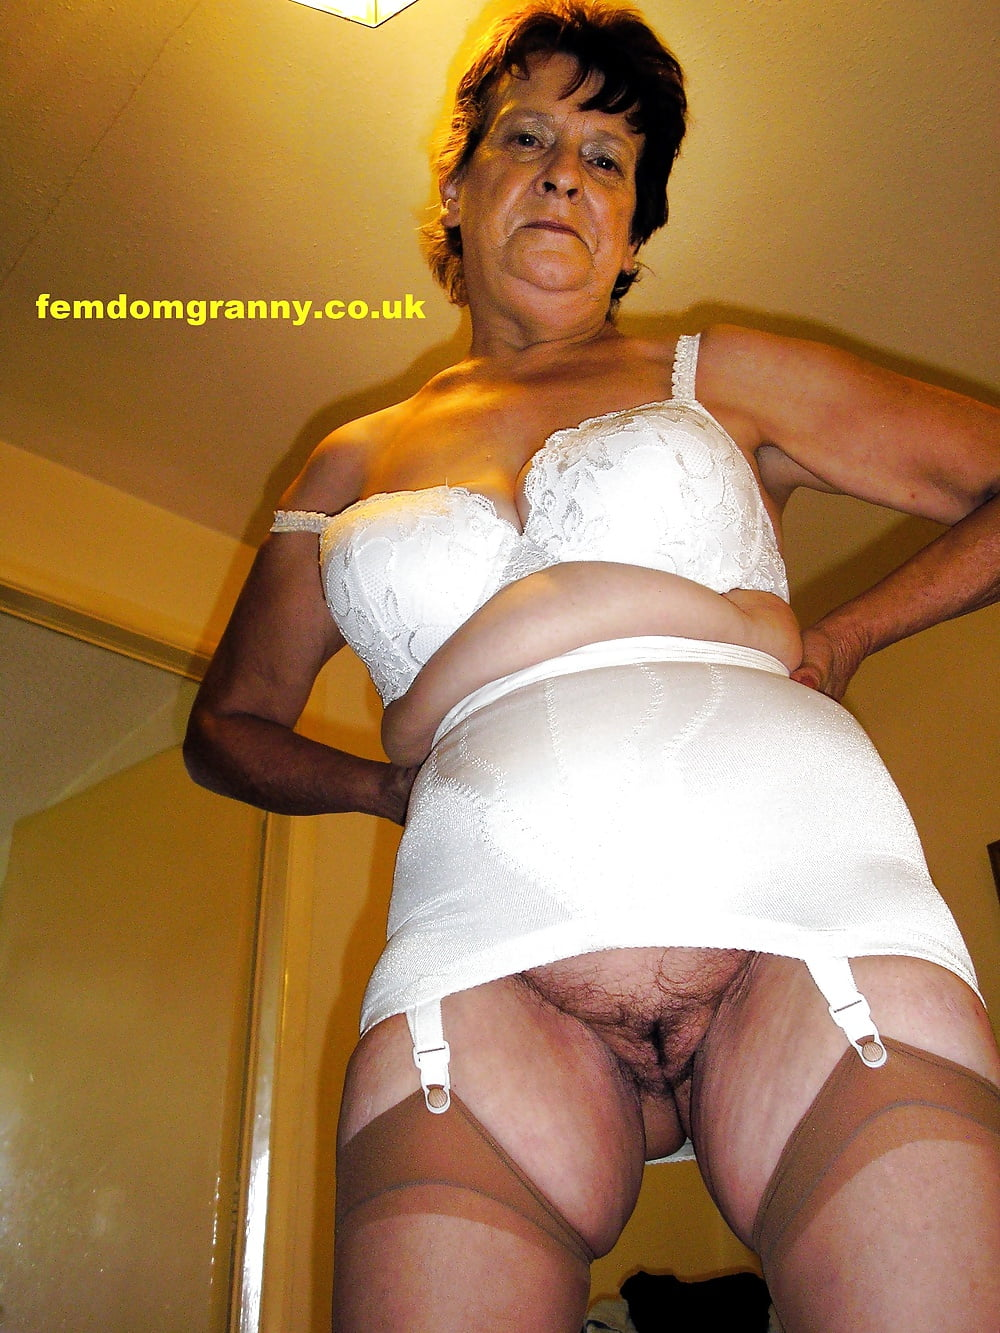 Mature lesbian girdle fitting pics